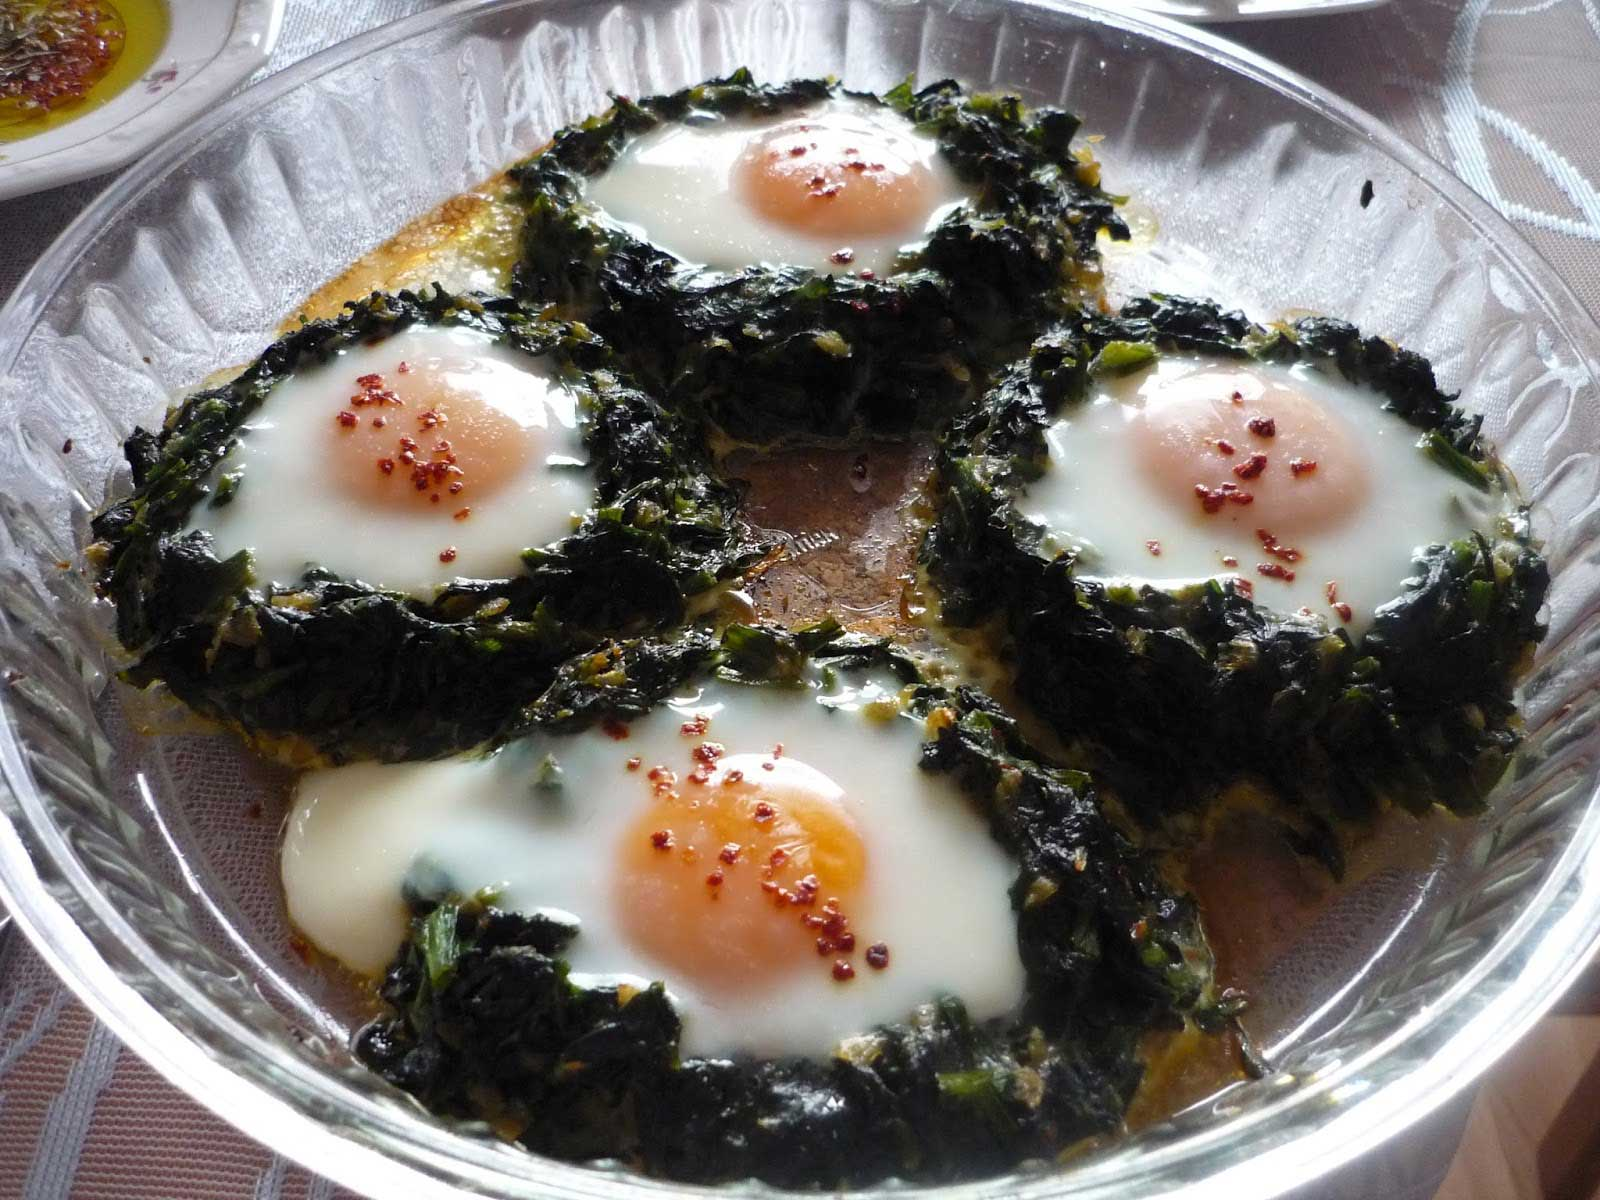 Spinat mit Ei im Ofen - Fırında Ispanaklı Yumurta